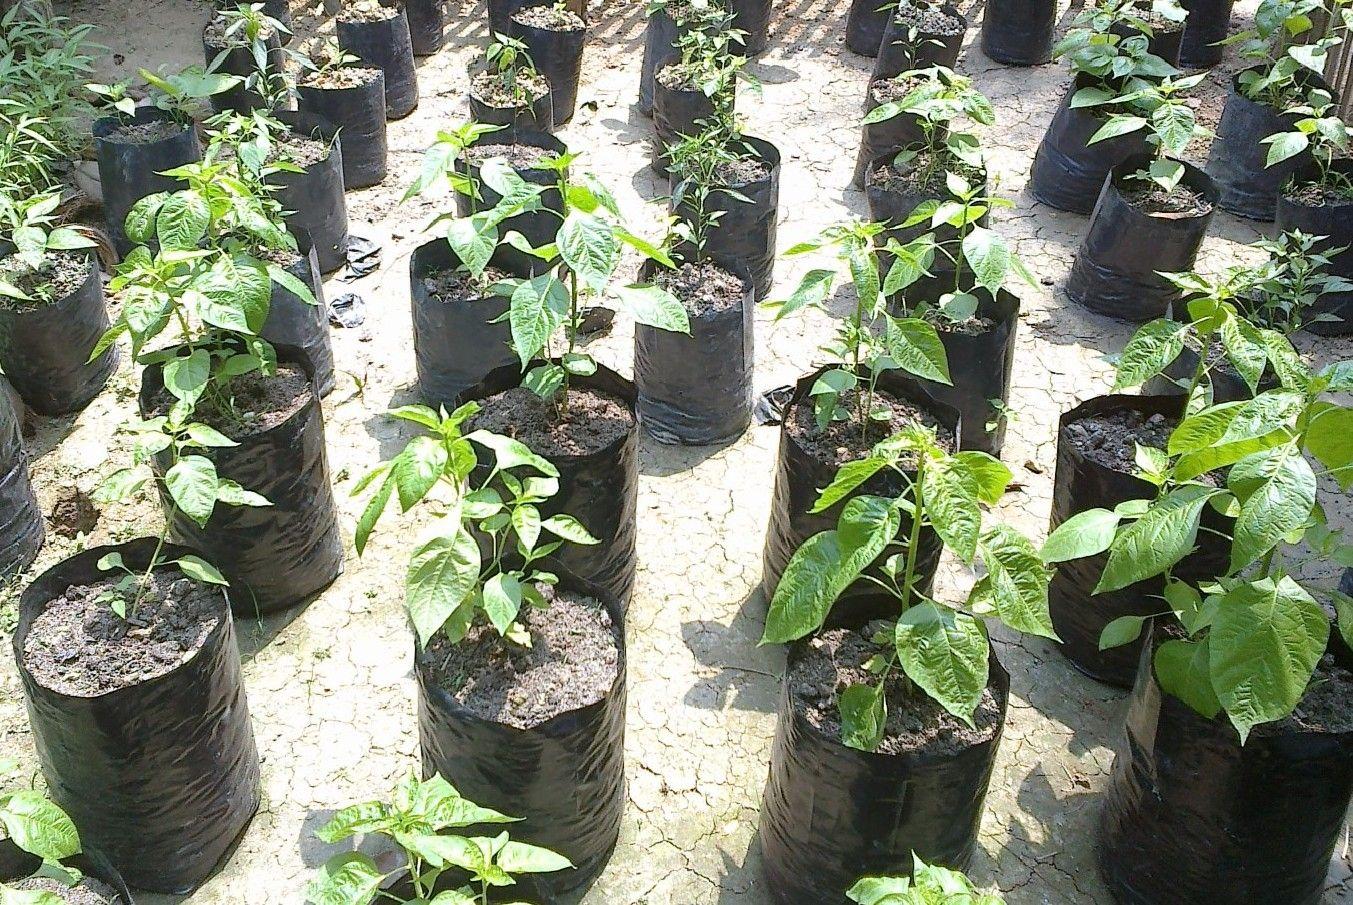 Cara menanam dan merawat monstera (janda bolong). Cara Menanam Cabe Rawit Di Polybag | Menanam, Kebun, Tanaman